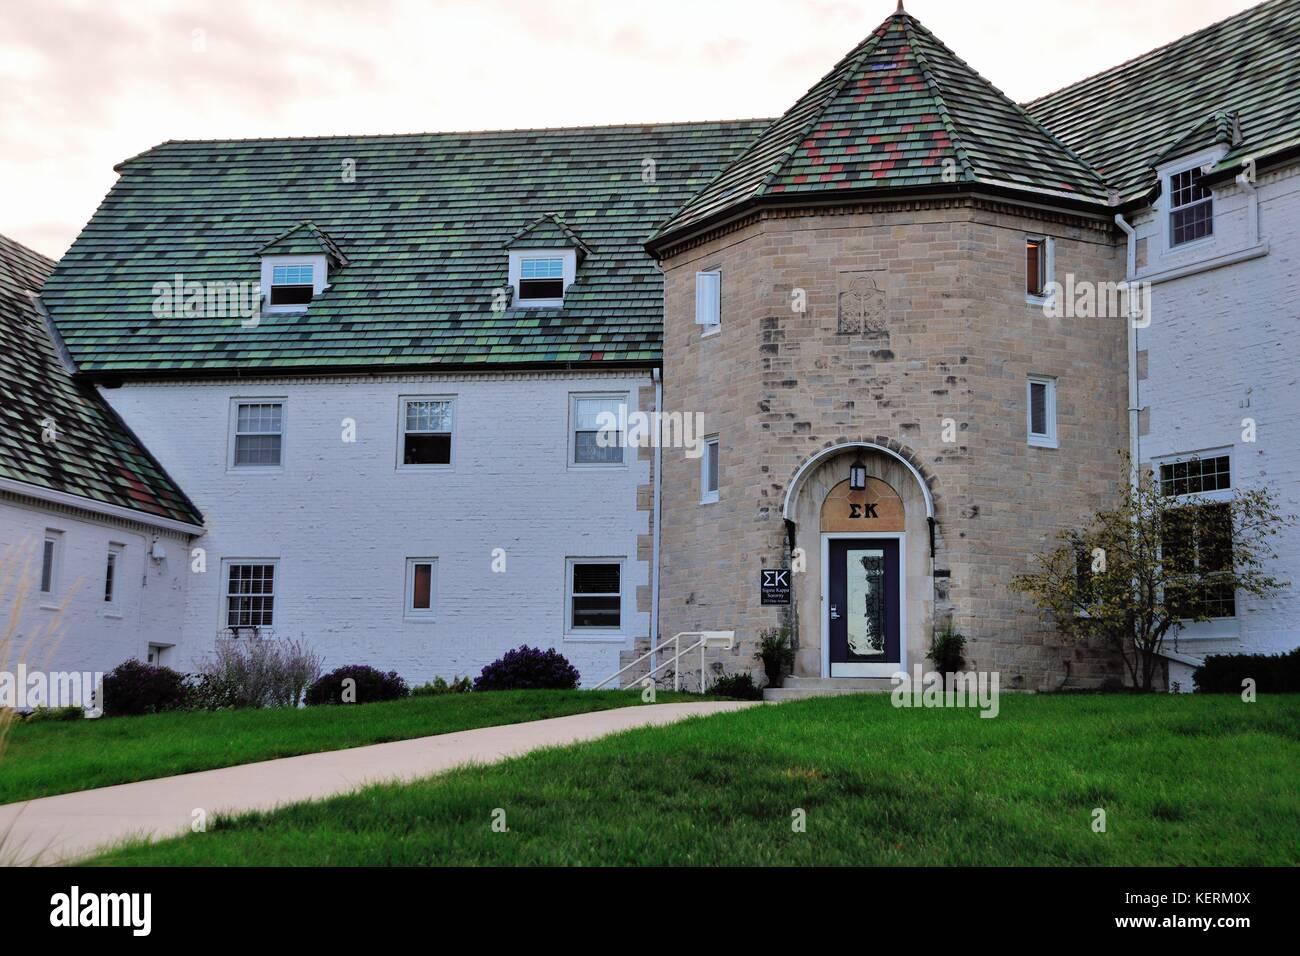 Sigma Kappa sorority on the campus of Iowa State University in Ames, Iowa., USA. Stock Photo